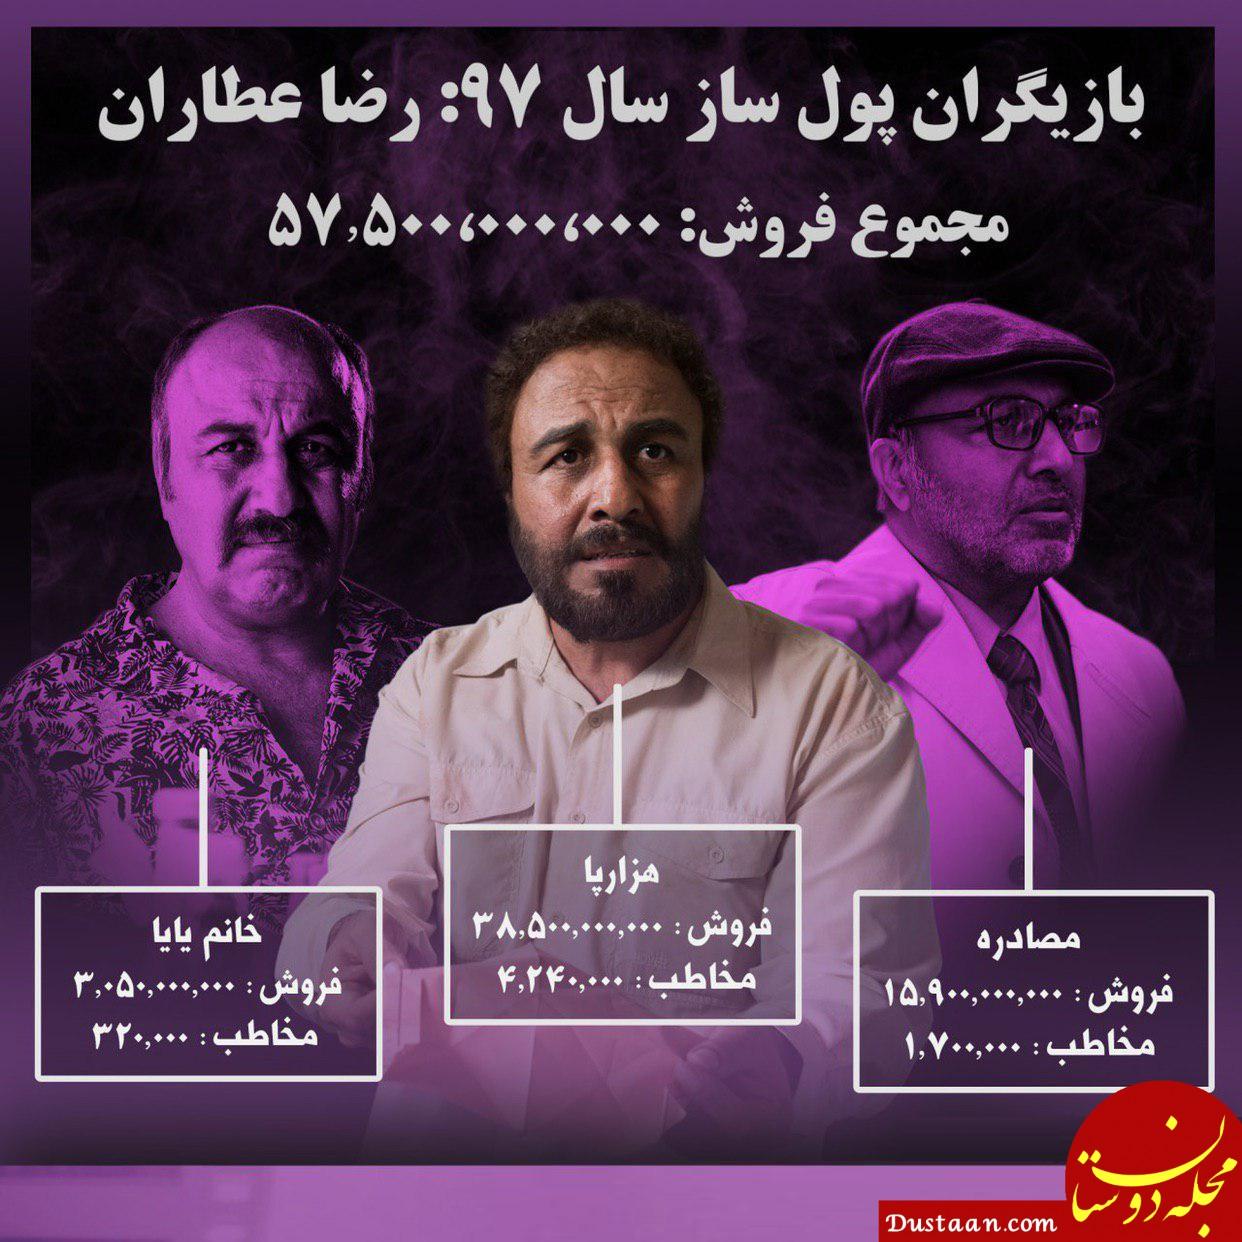 www.dustaan.com رضا عطاران دومین بازیگر پول ساز سال ۹۷